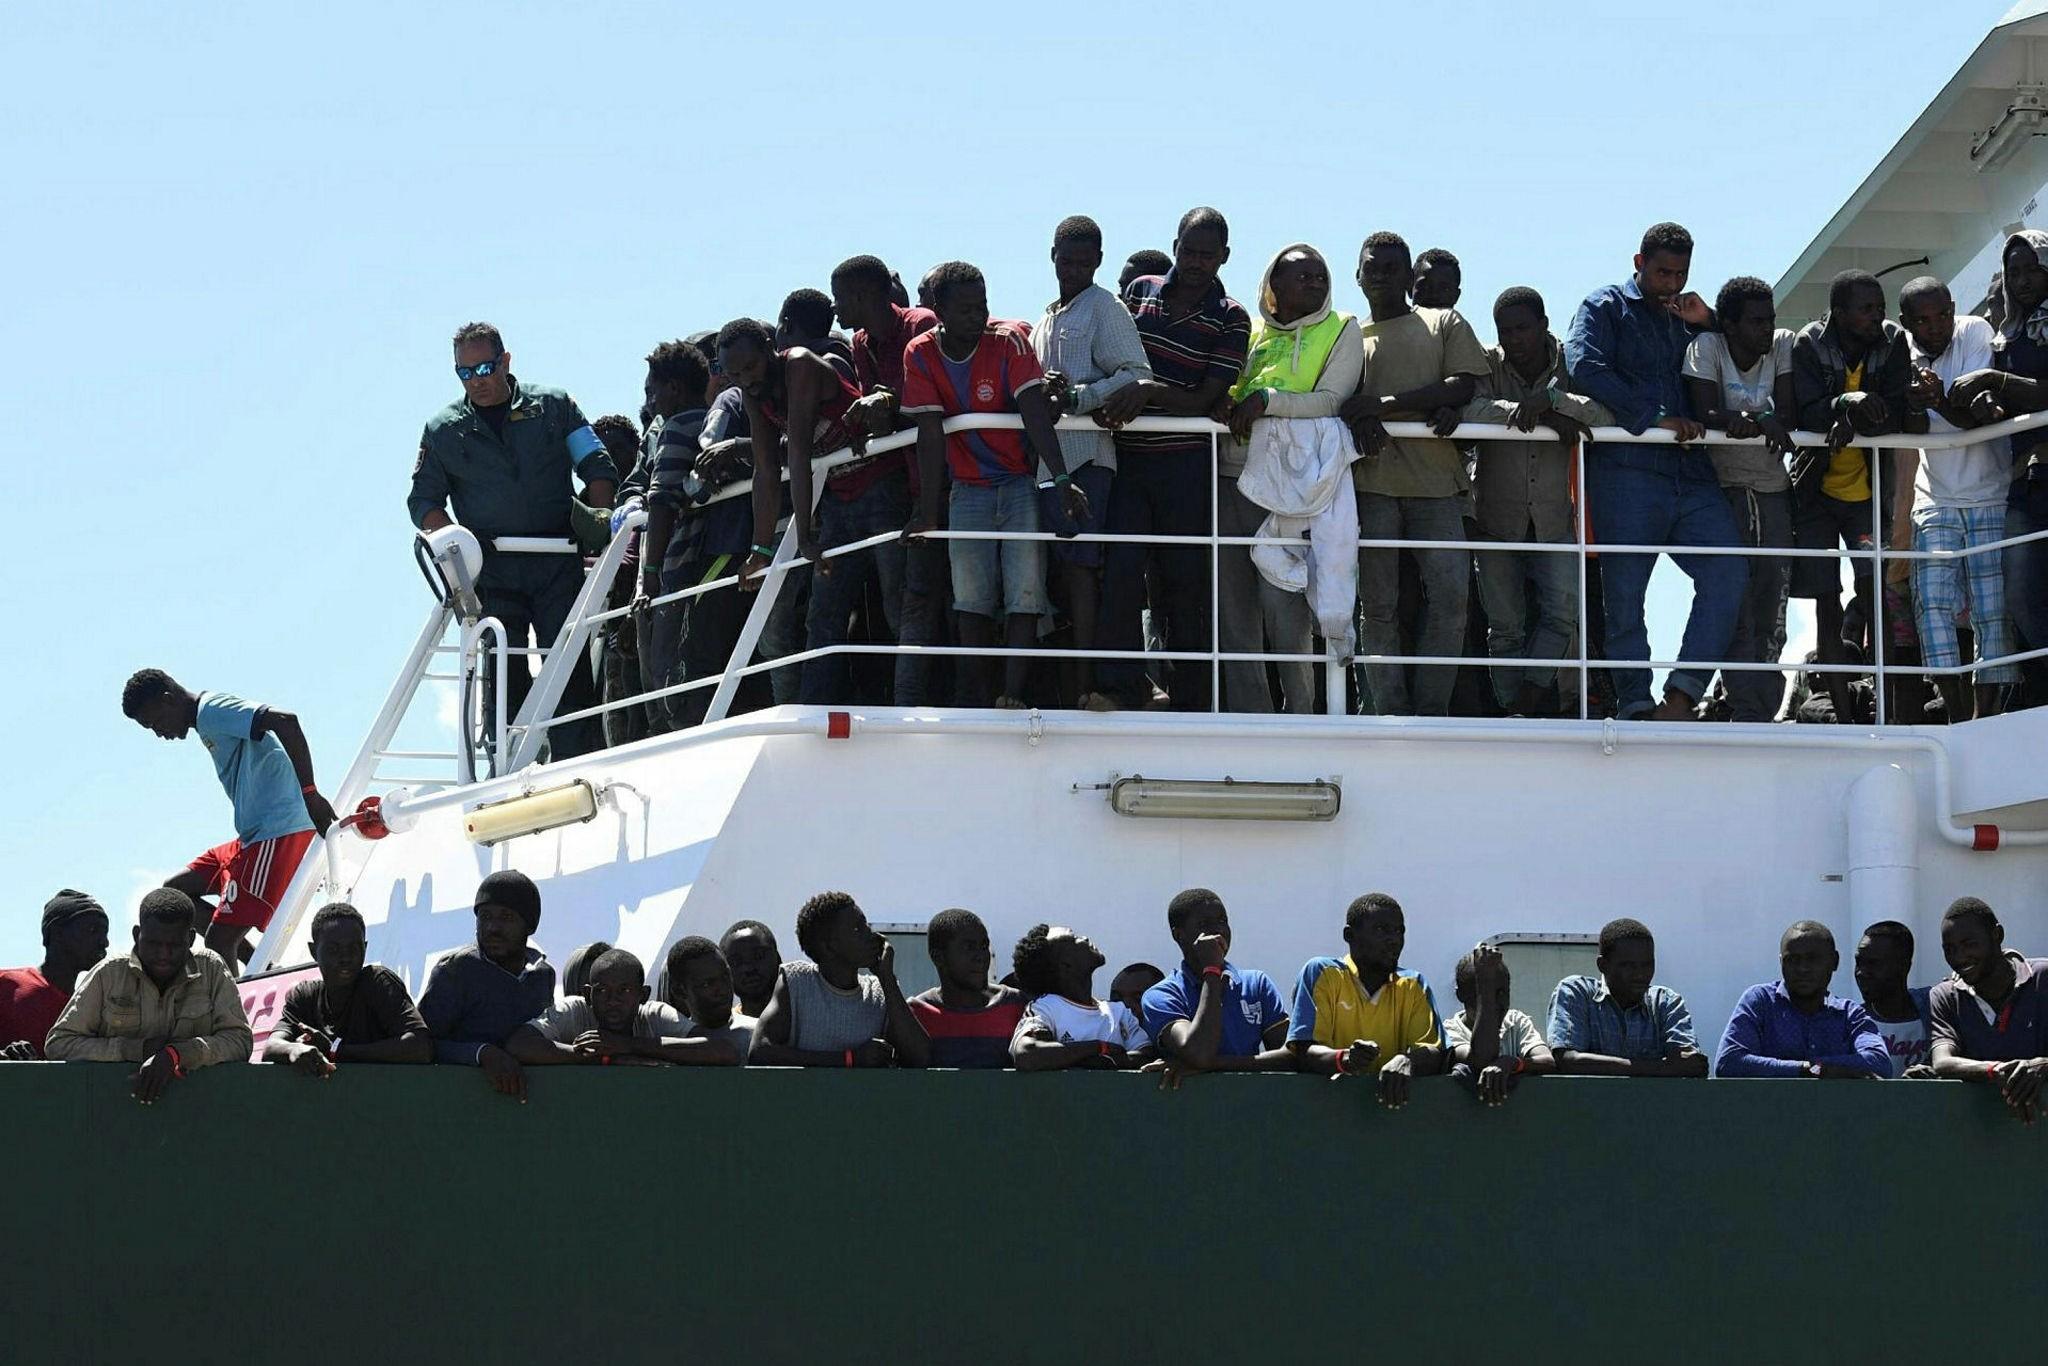 Migrants wait to disembark from the Spanish ship 'Rio Segura' in the harbor of Salerno, Italy, June 29.